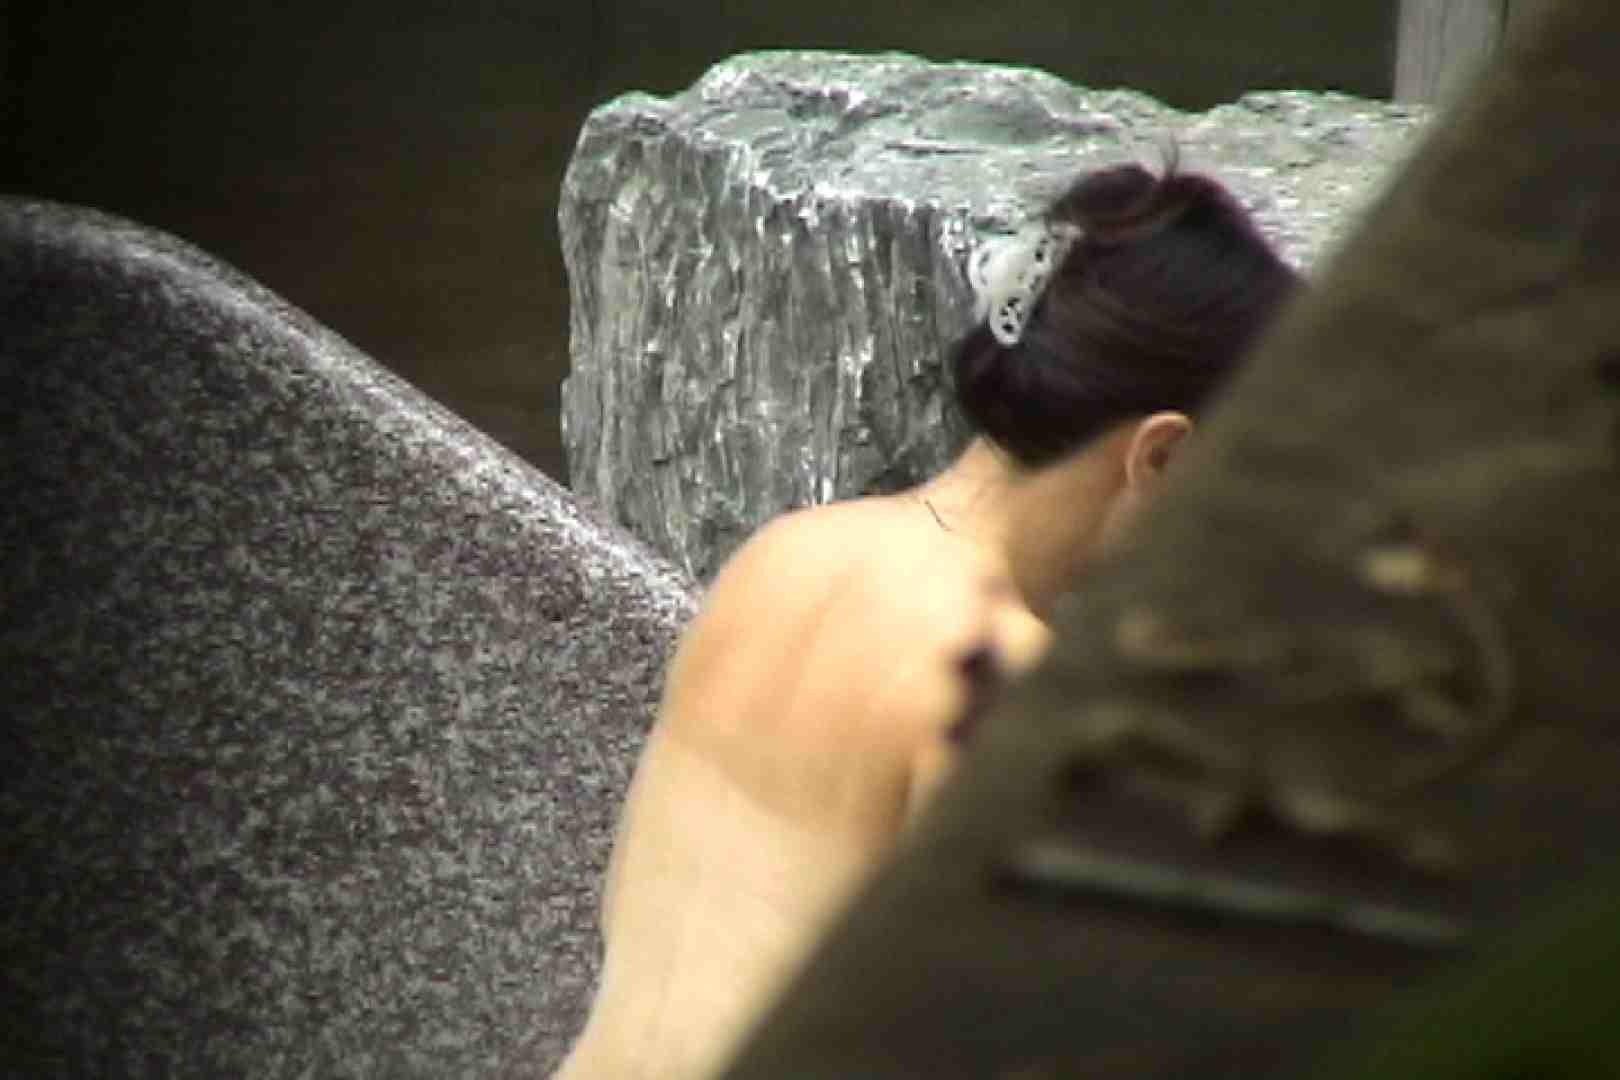 Aquaな露天風呂Vol.701 露天 すけべAV動画紹介 89連発 14